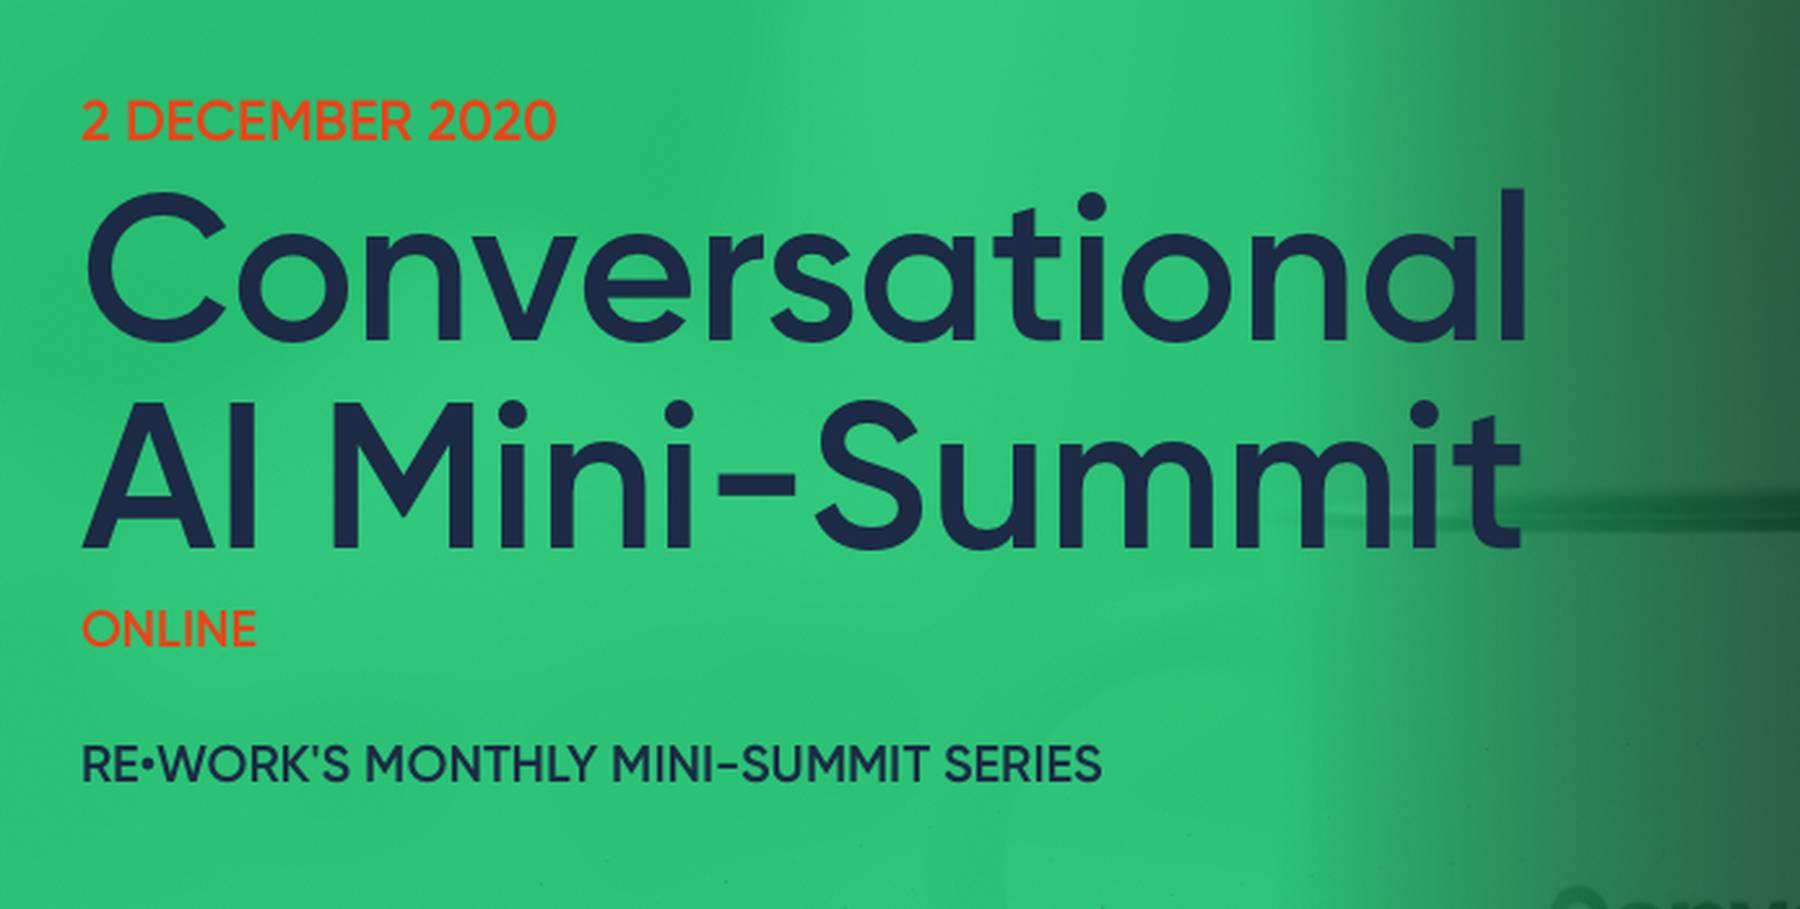 Conversational AI Mini-Summit